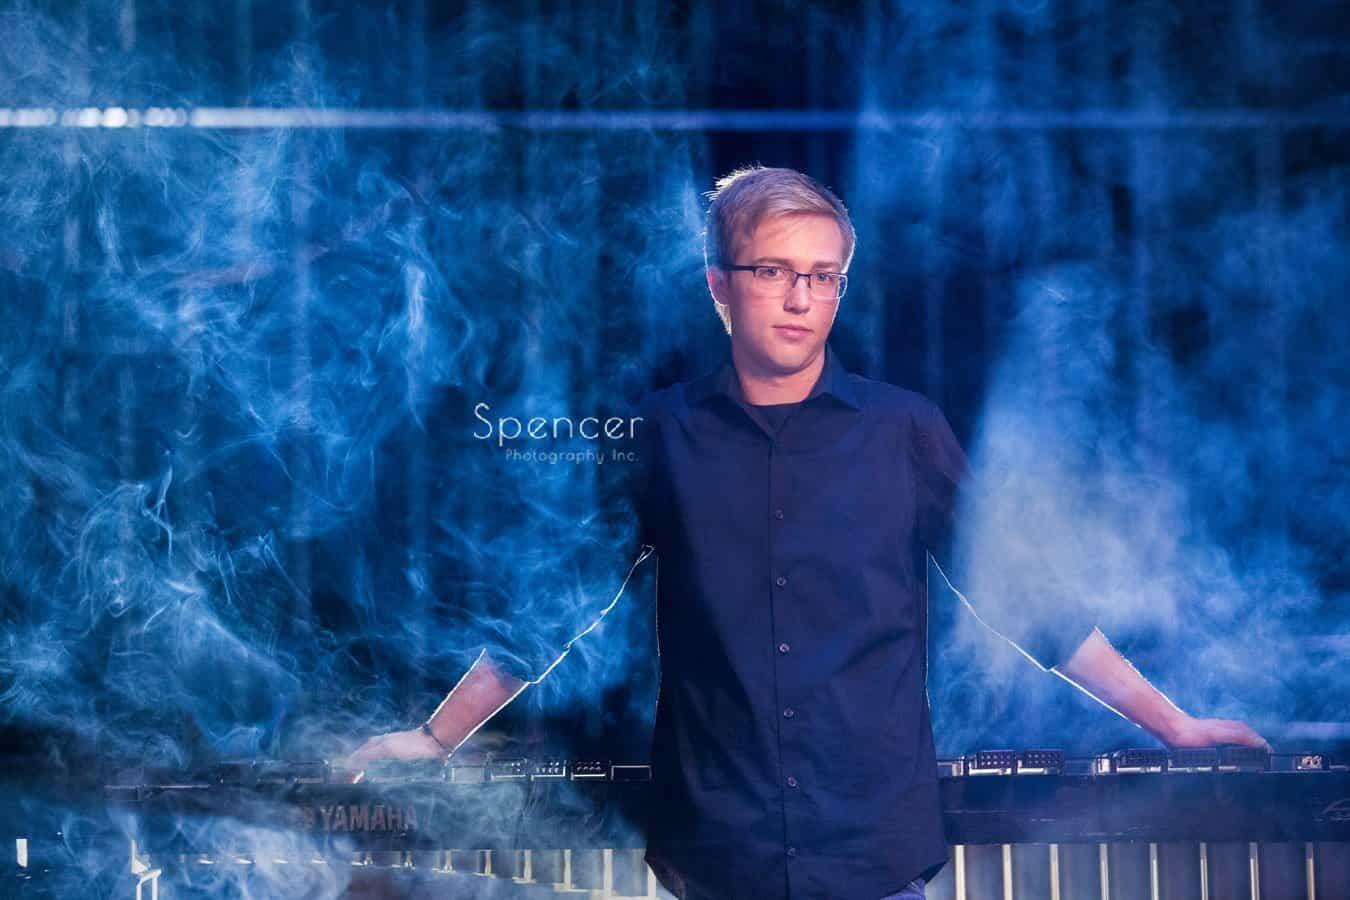 unique senior picture with smoke surrounding student